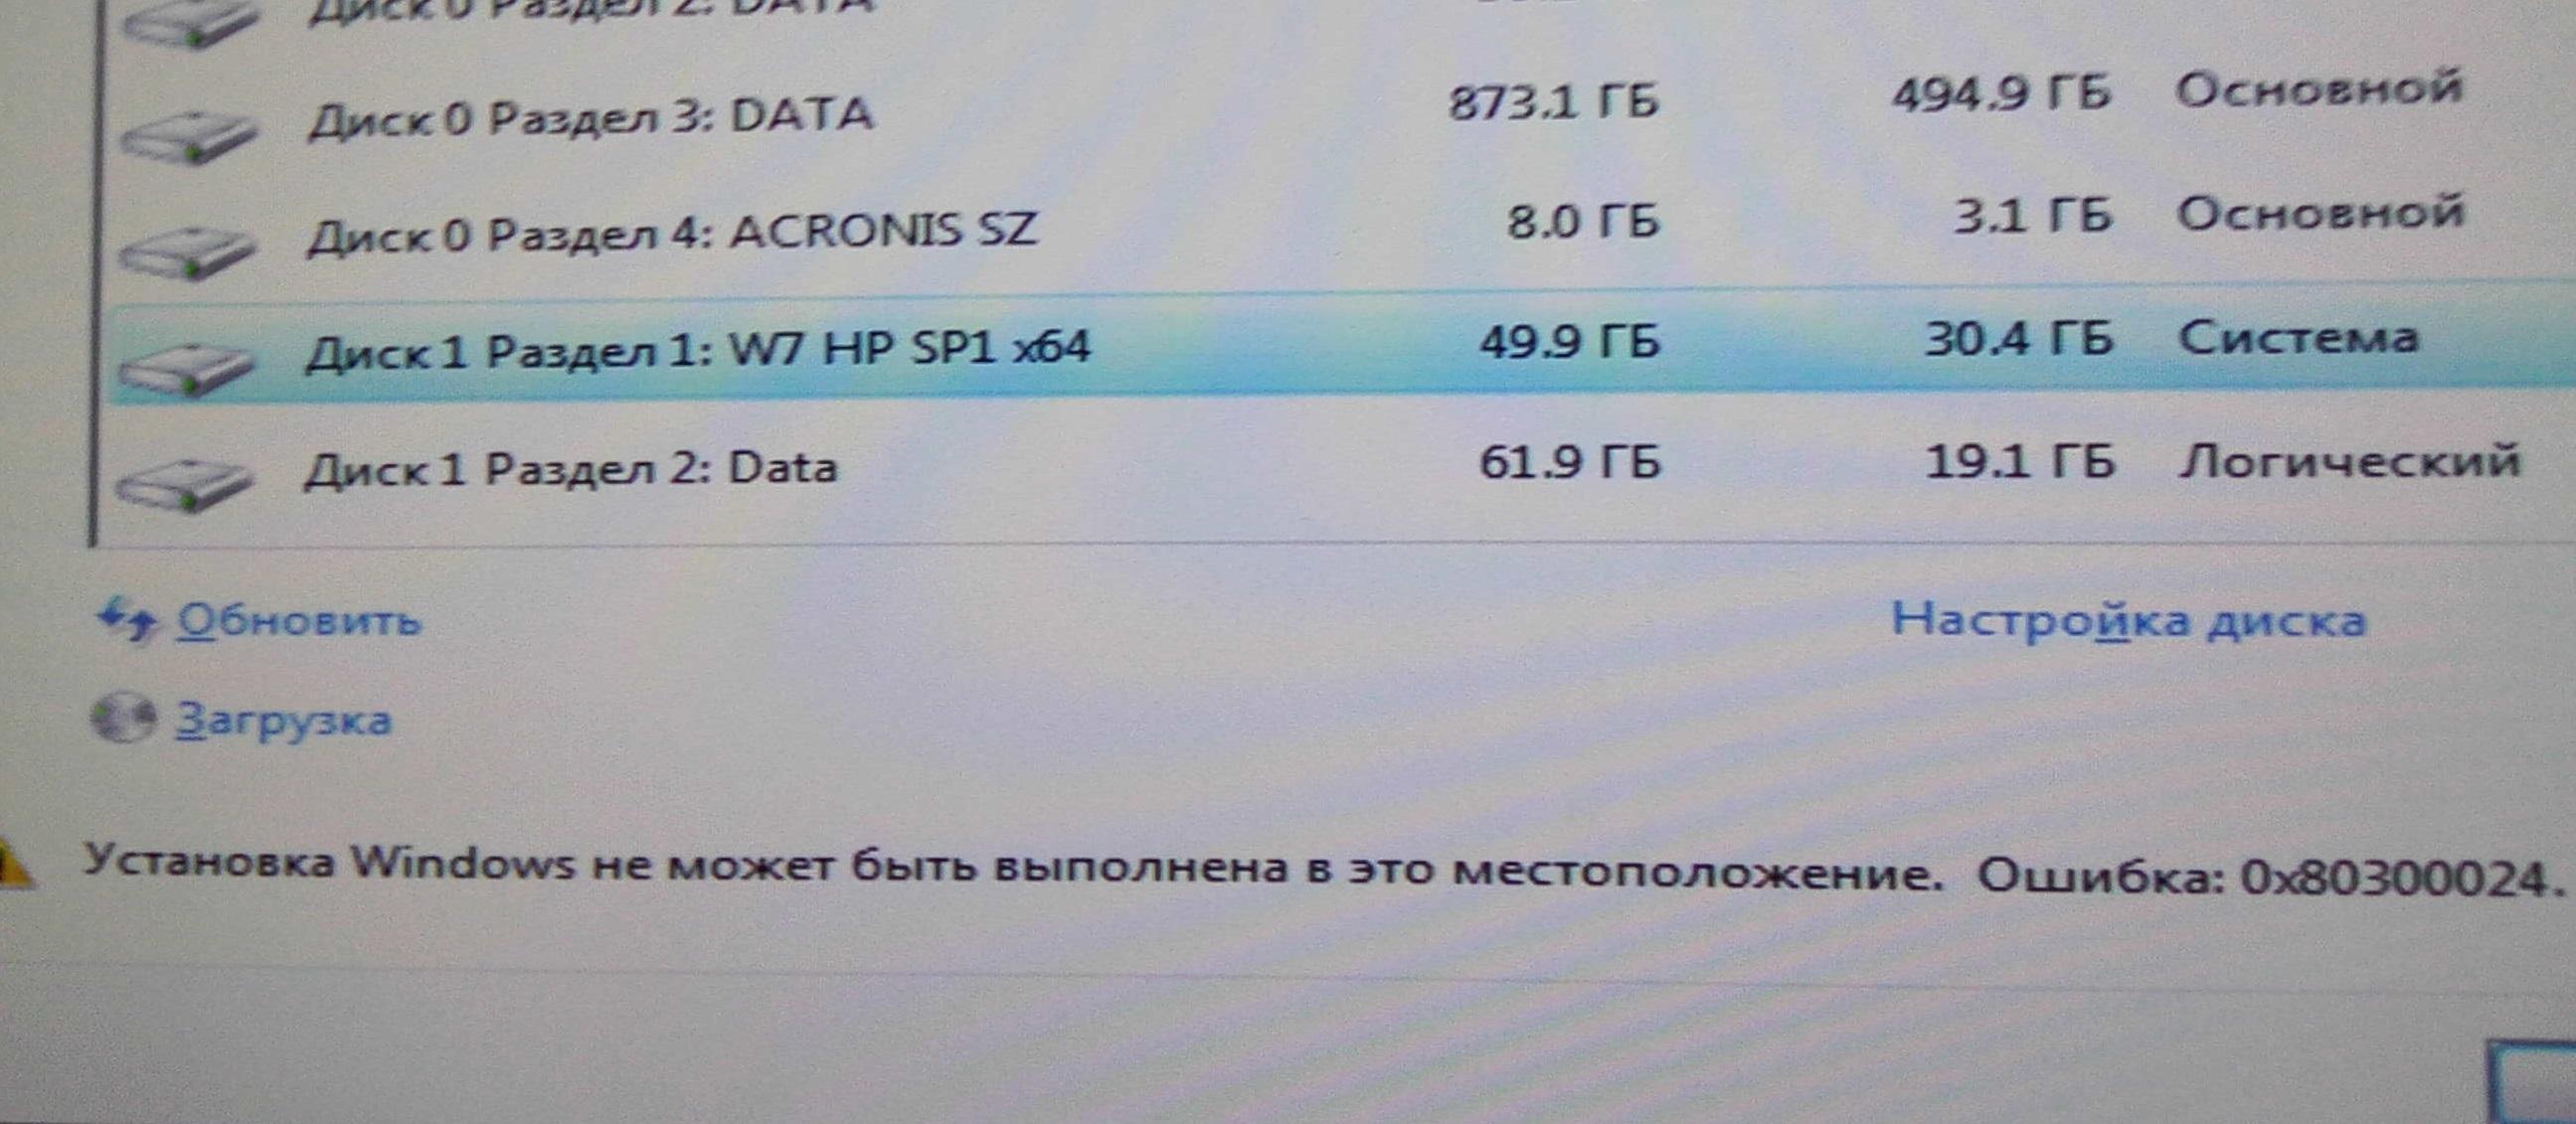 oshibka-0x80300024-pri-ustanovke-windows-7